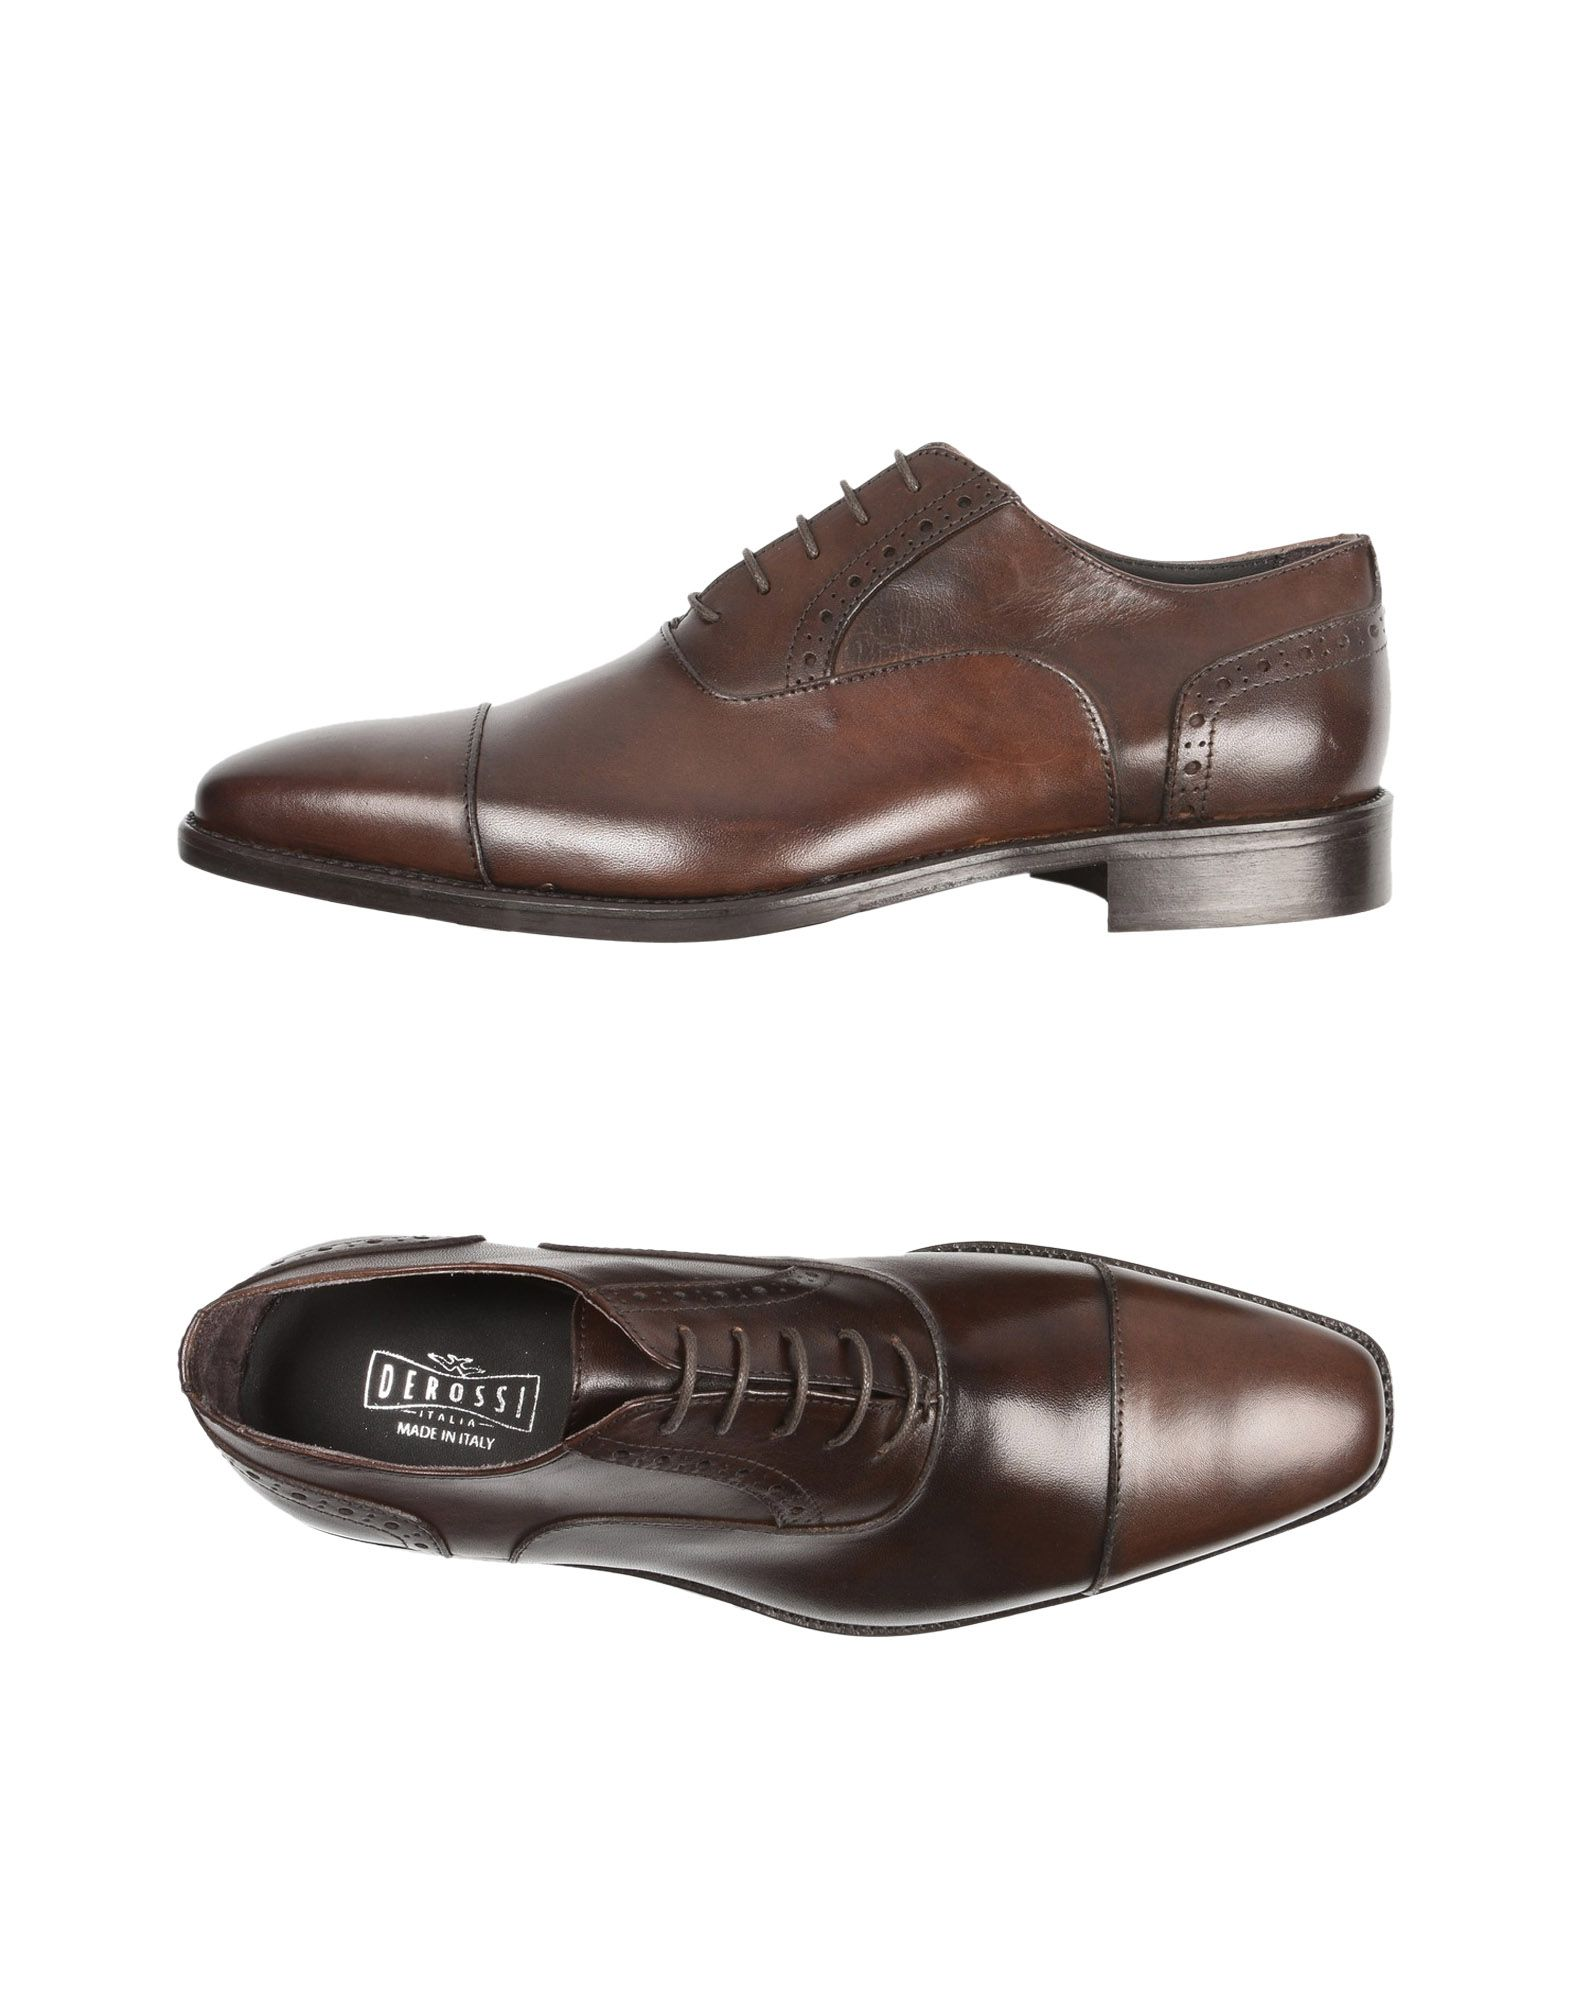 Derossi Derossi Derossi Italia Schnürschuhe Herren  11527570XH Neue Schuhe a4a255